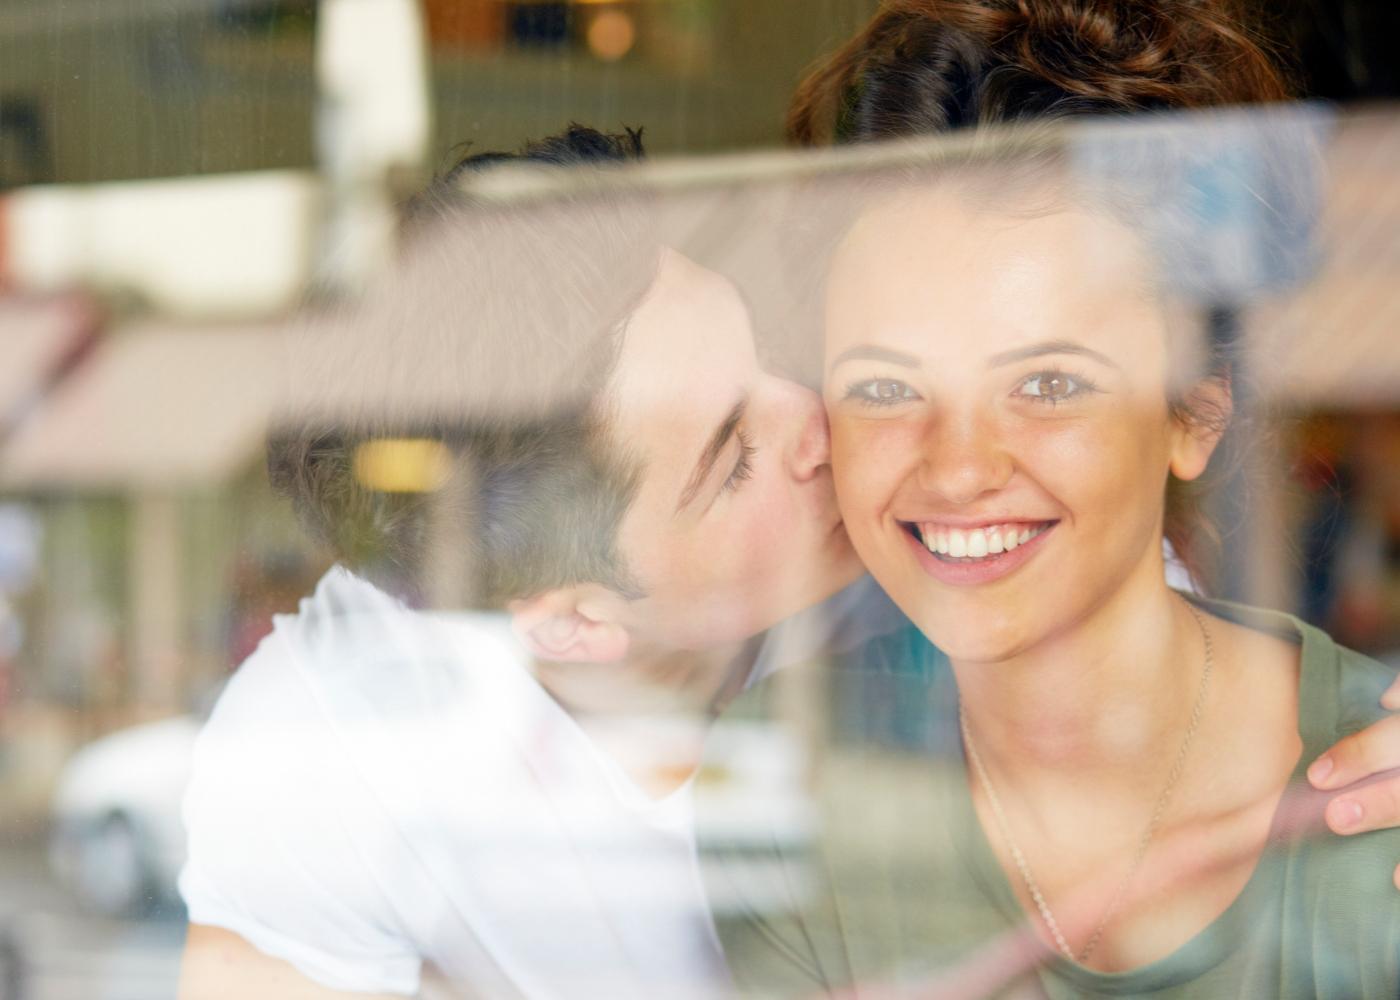 Casal de adolescentes a namorar